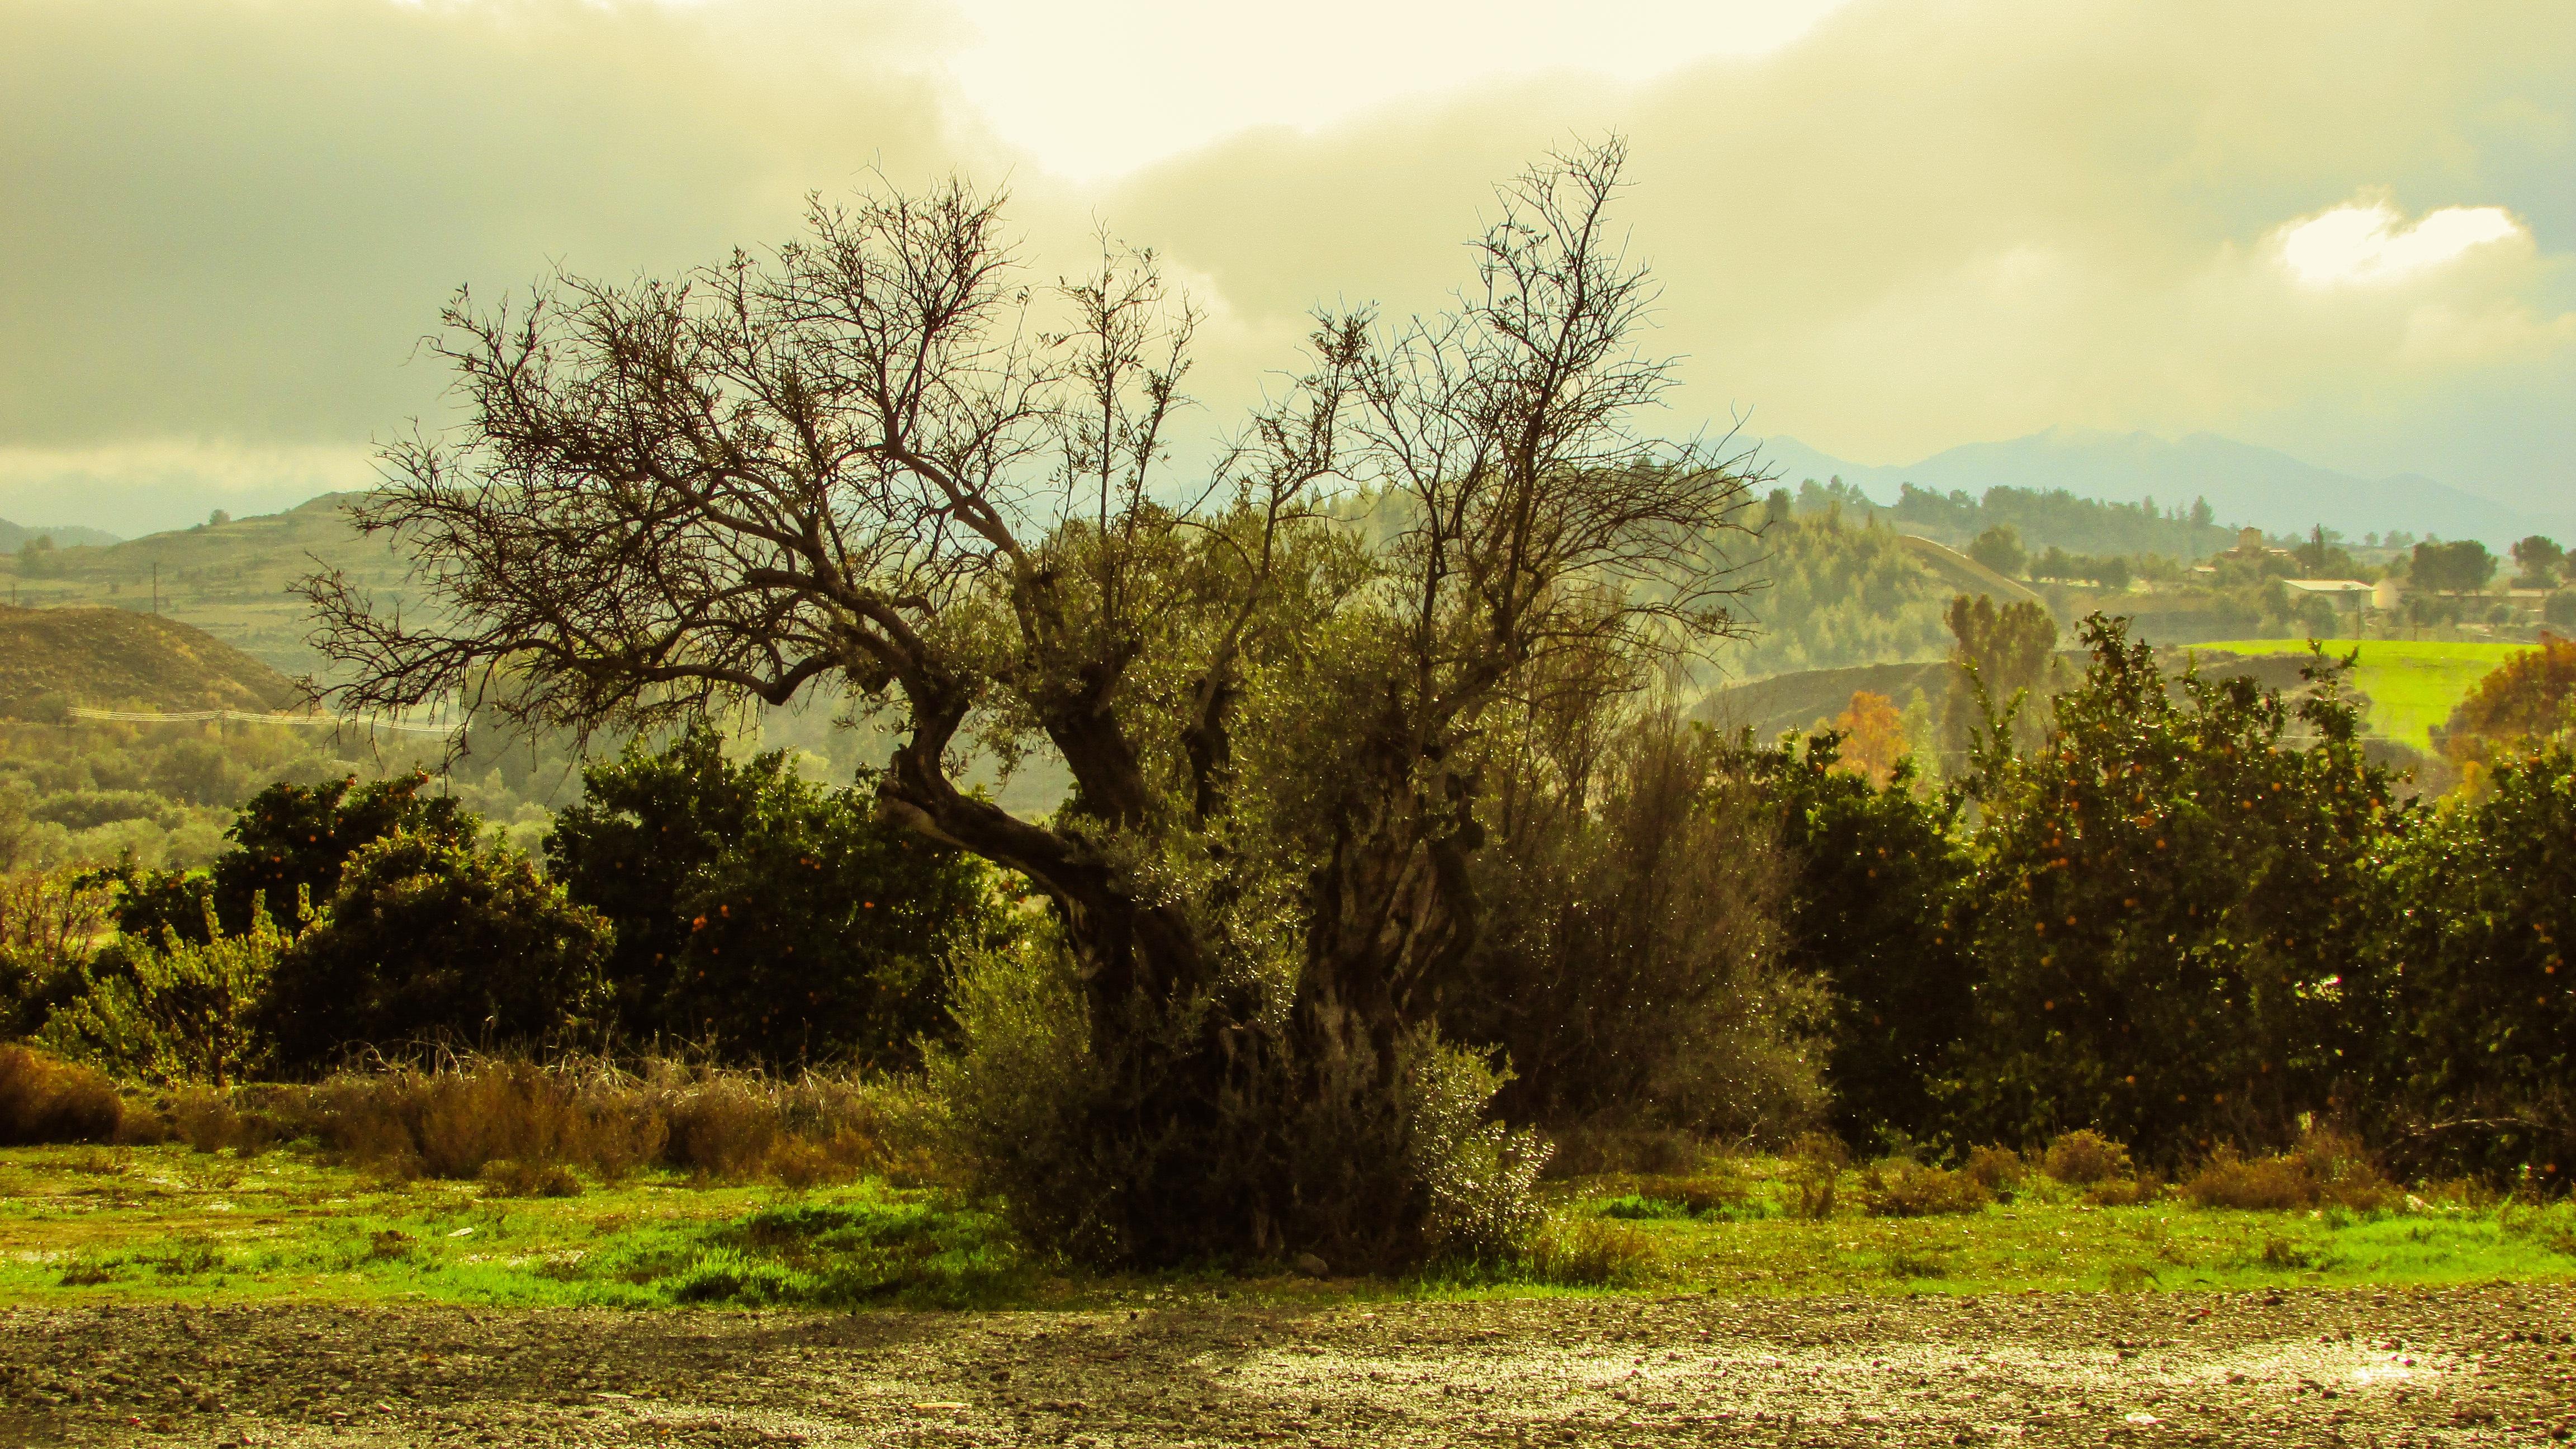 Gambar Pemandangan Alam Hutan Cabang Musim Dingin Awan